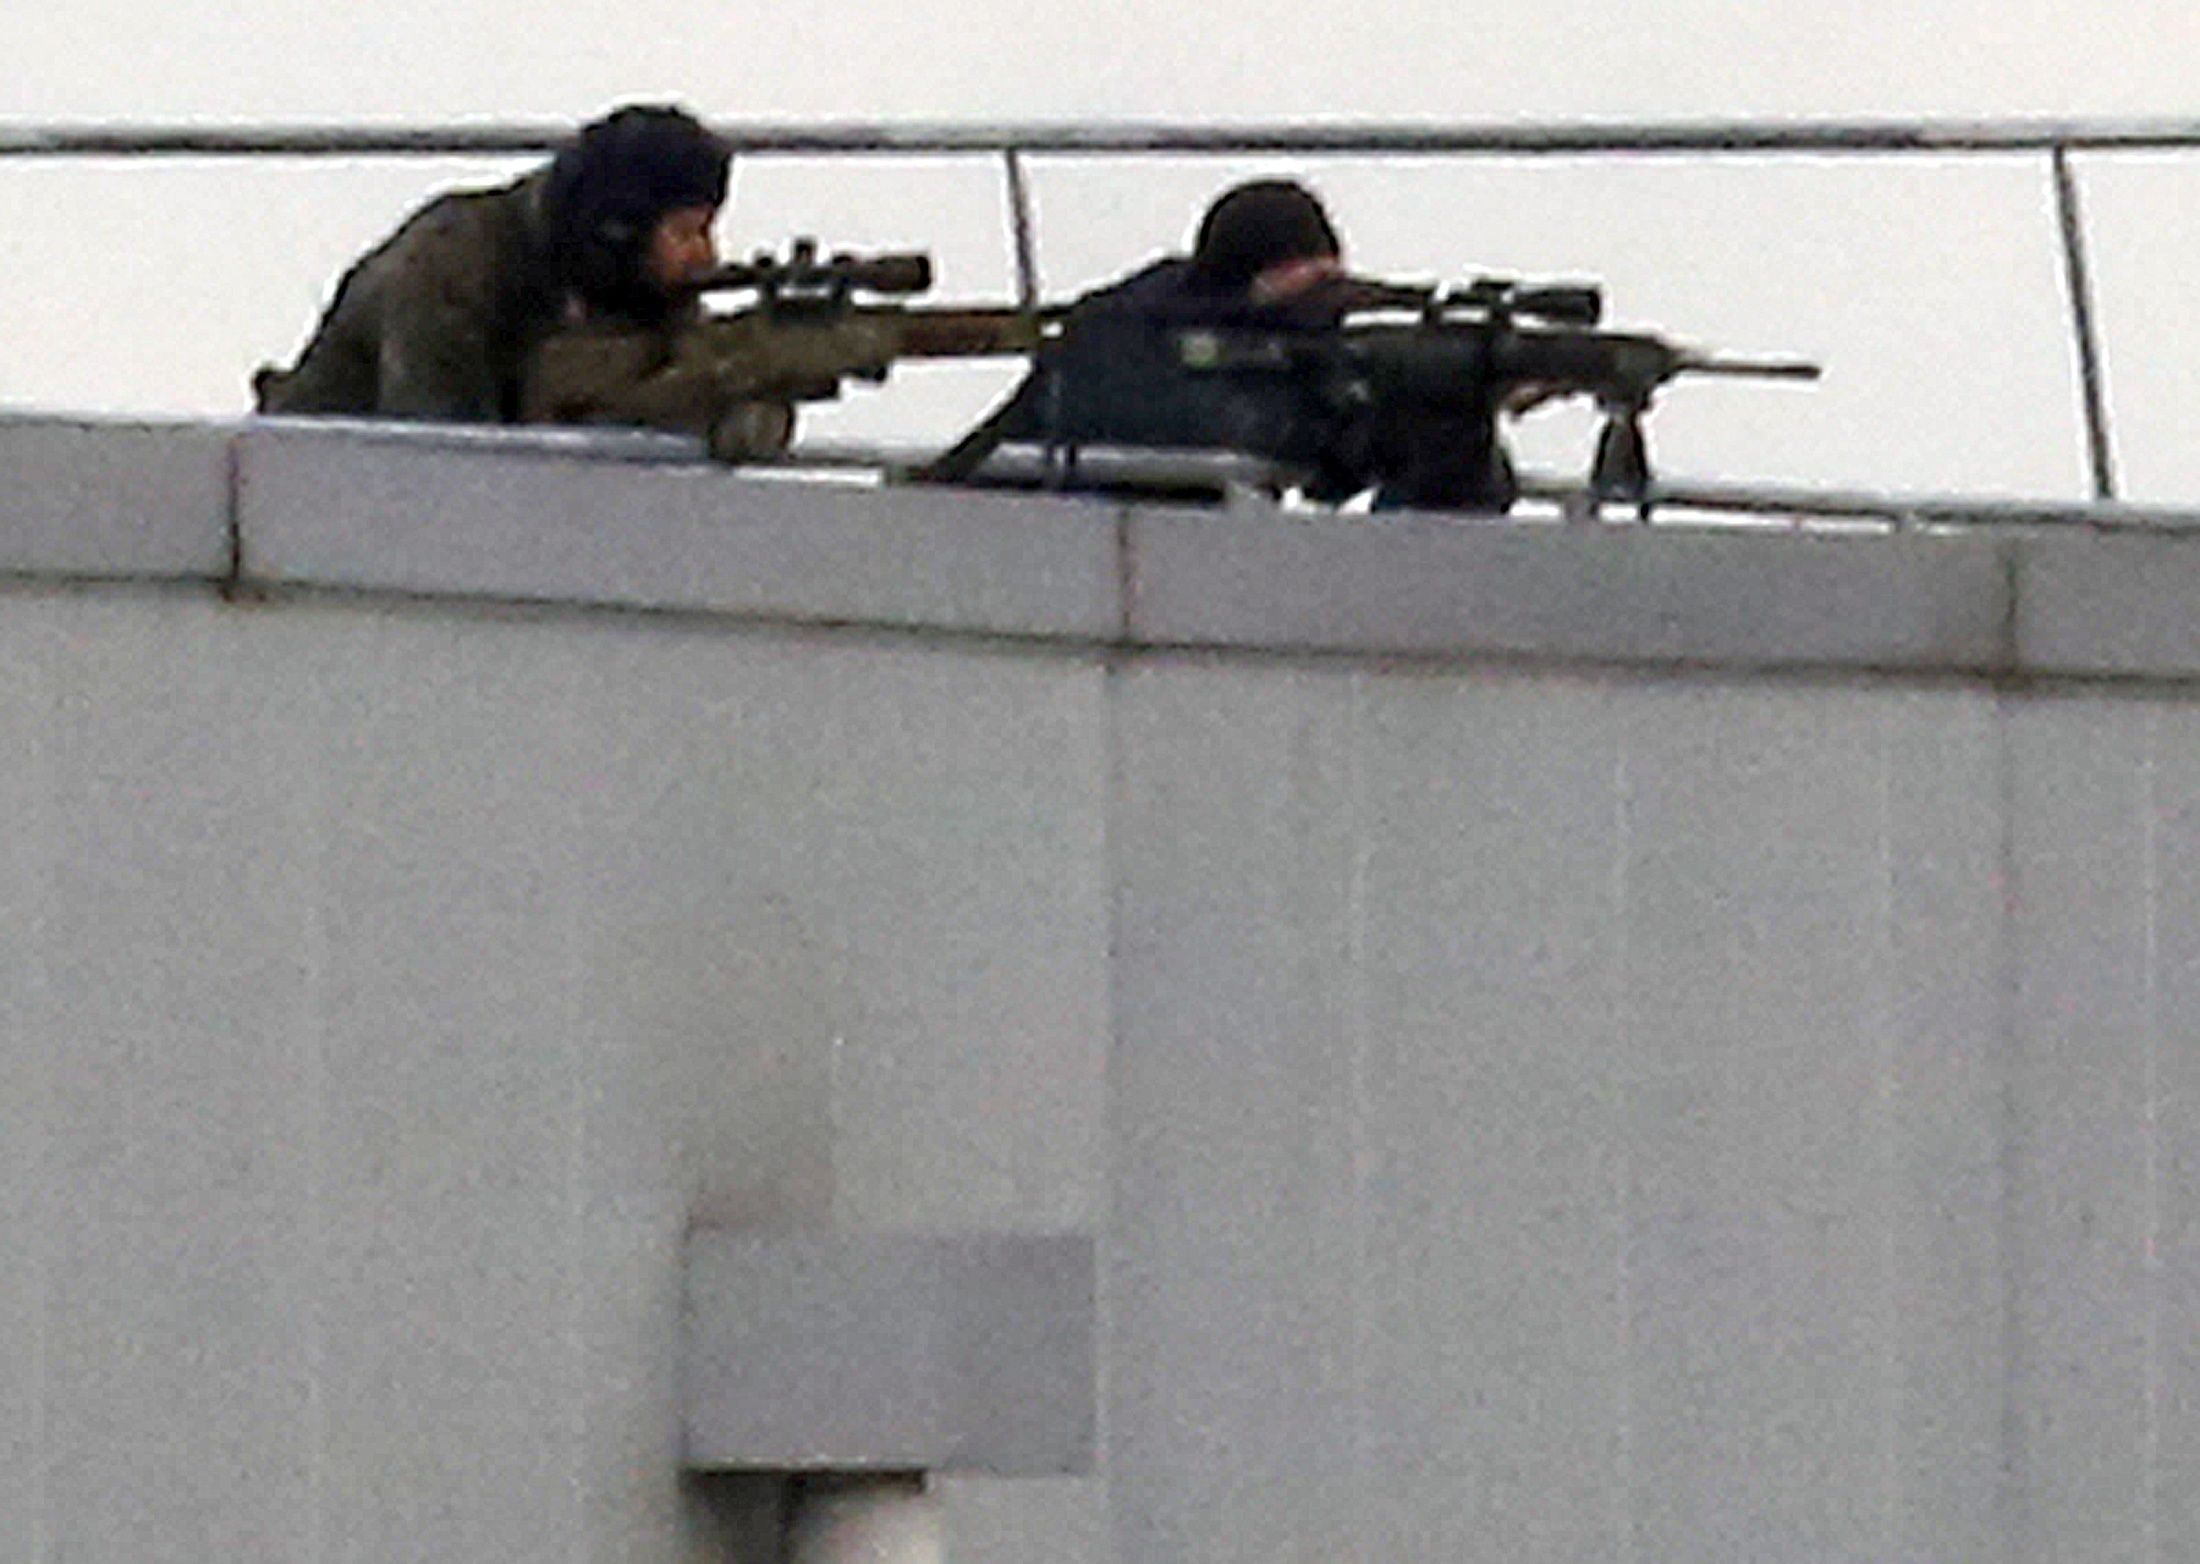 2015-01-09T162749Z_1_LYNXMPEB080PL_RTROPTP_4_FRANCE-SHOOTING-HOSTAGE